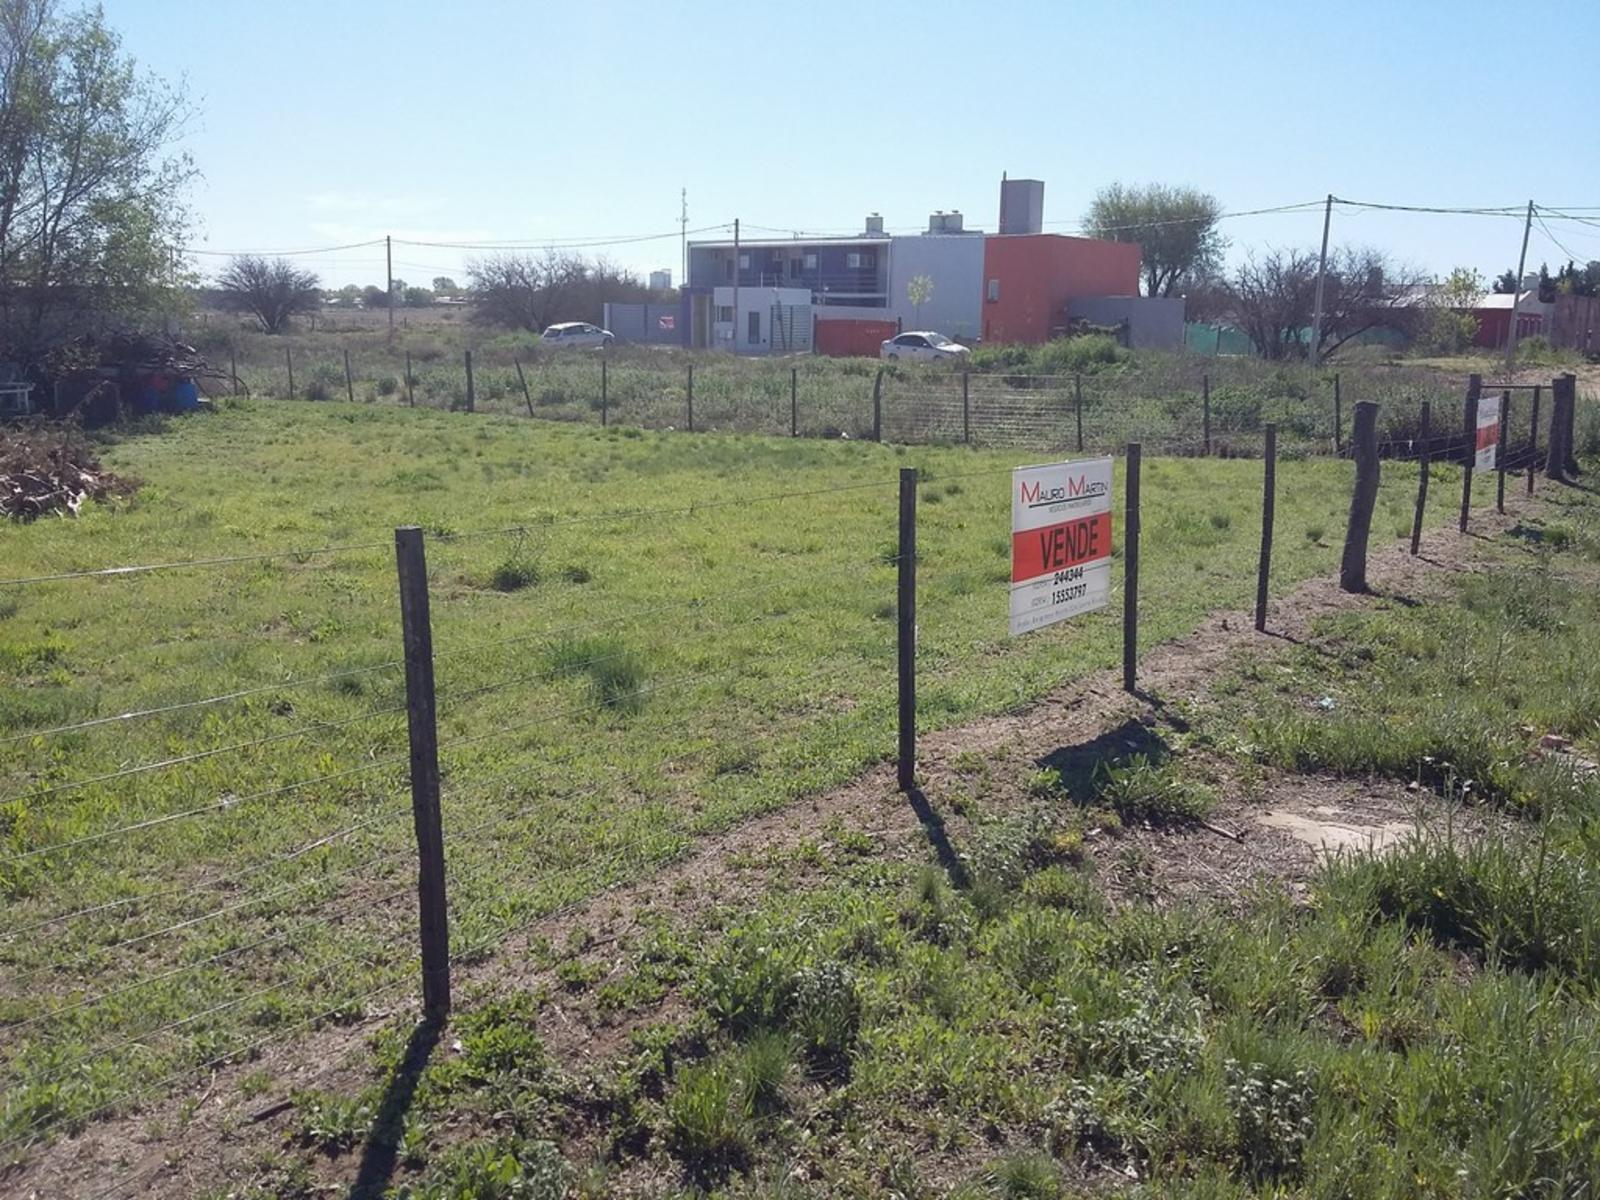 Lotes de 300 m2 en Santa Rosa, Mauro Martin Negocios Inmobiliarios